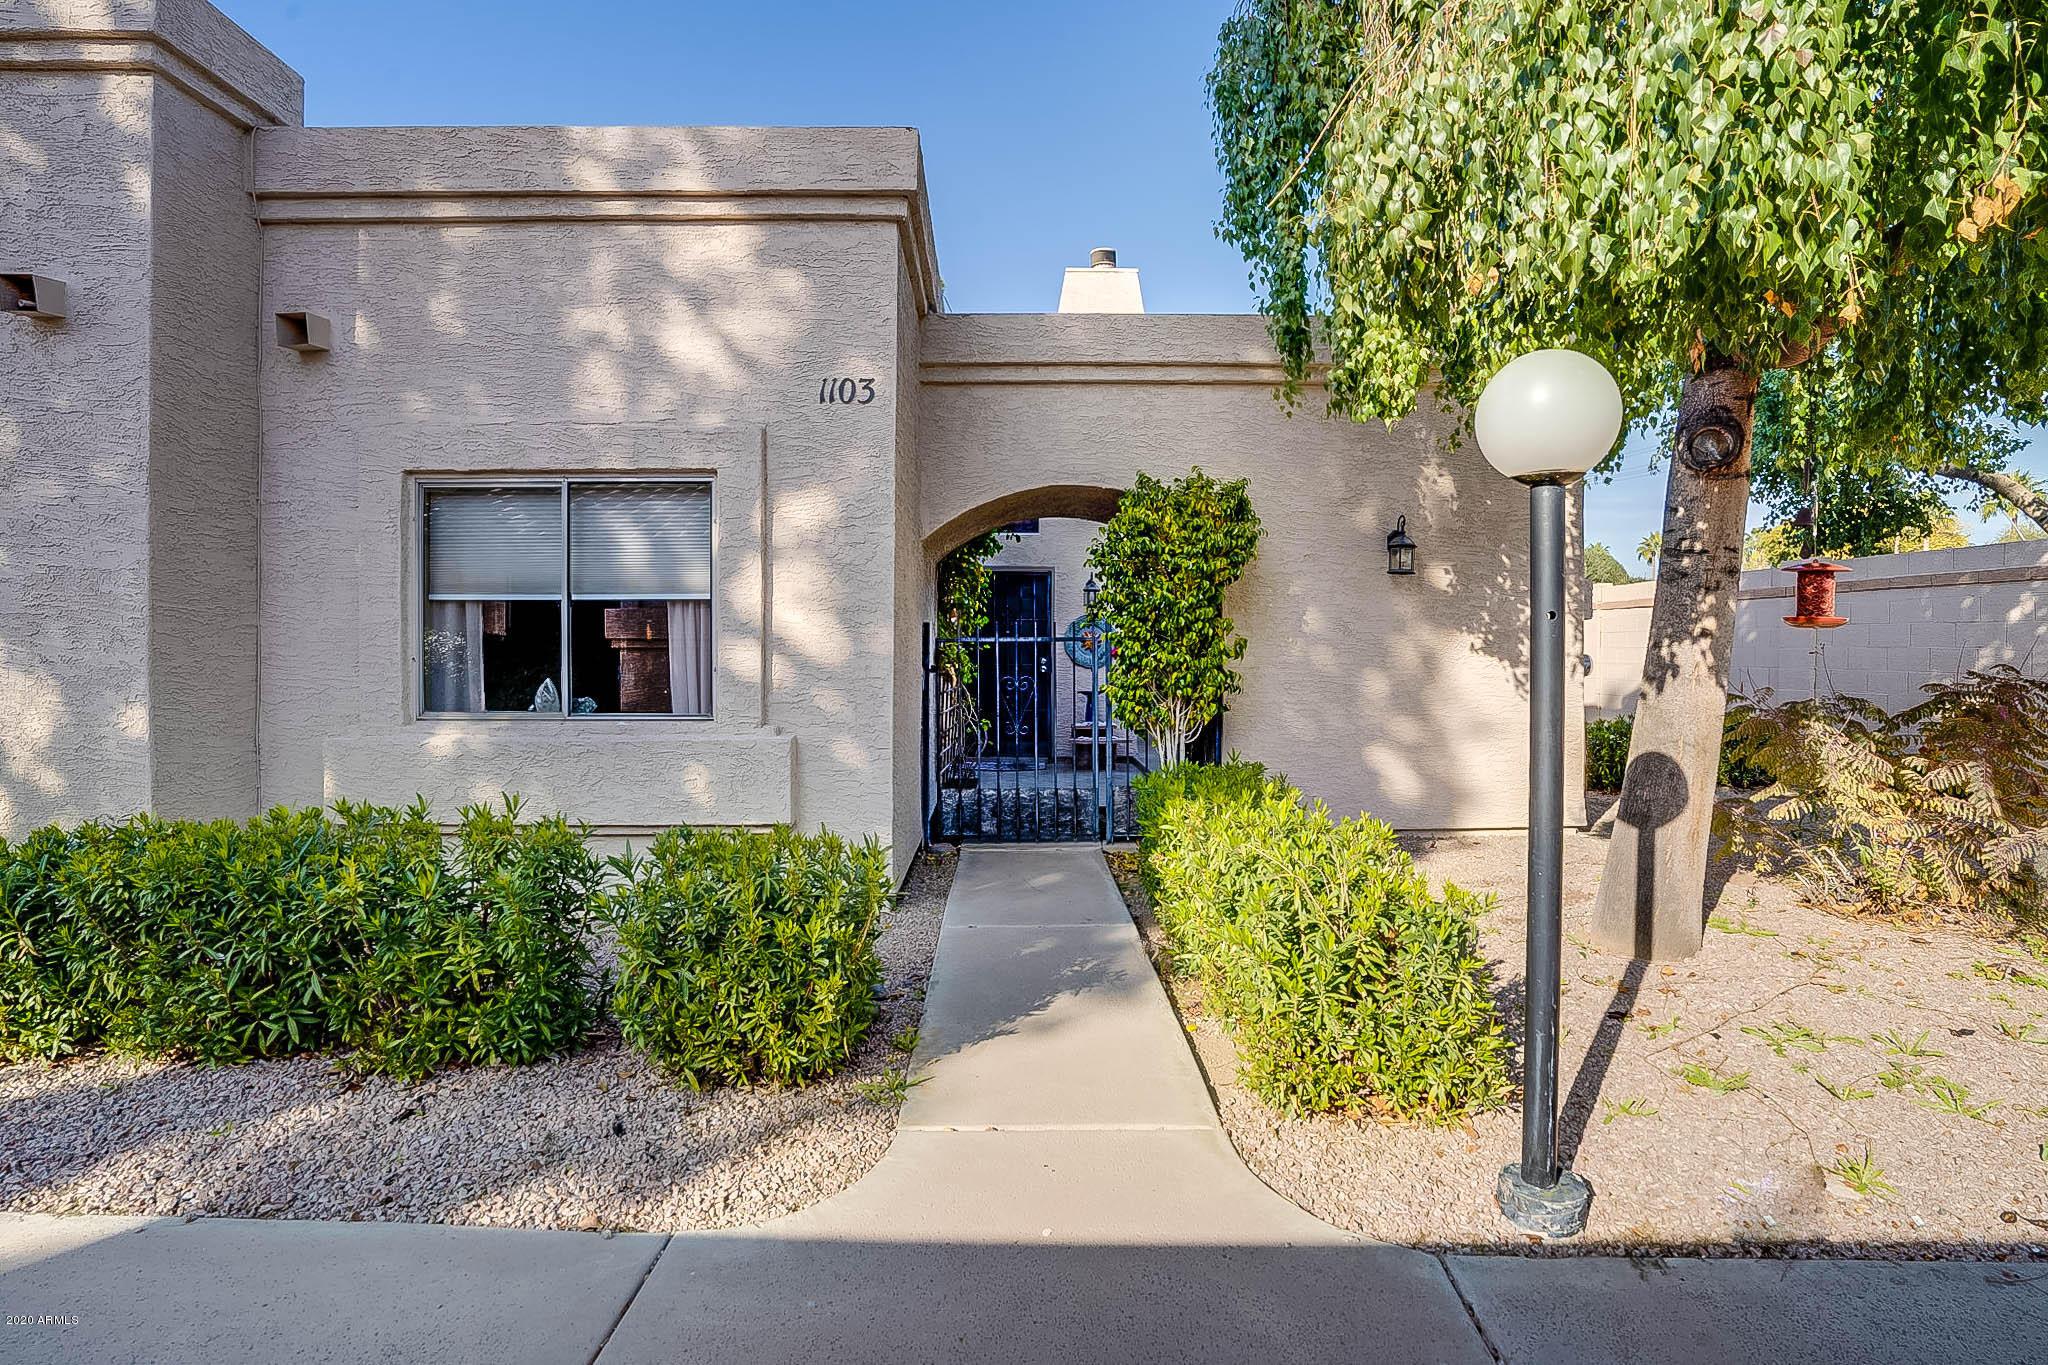 Photo of 2019 W LEMON TREE Place #1103, Chandler, AZ 85224